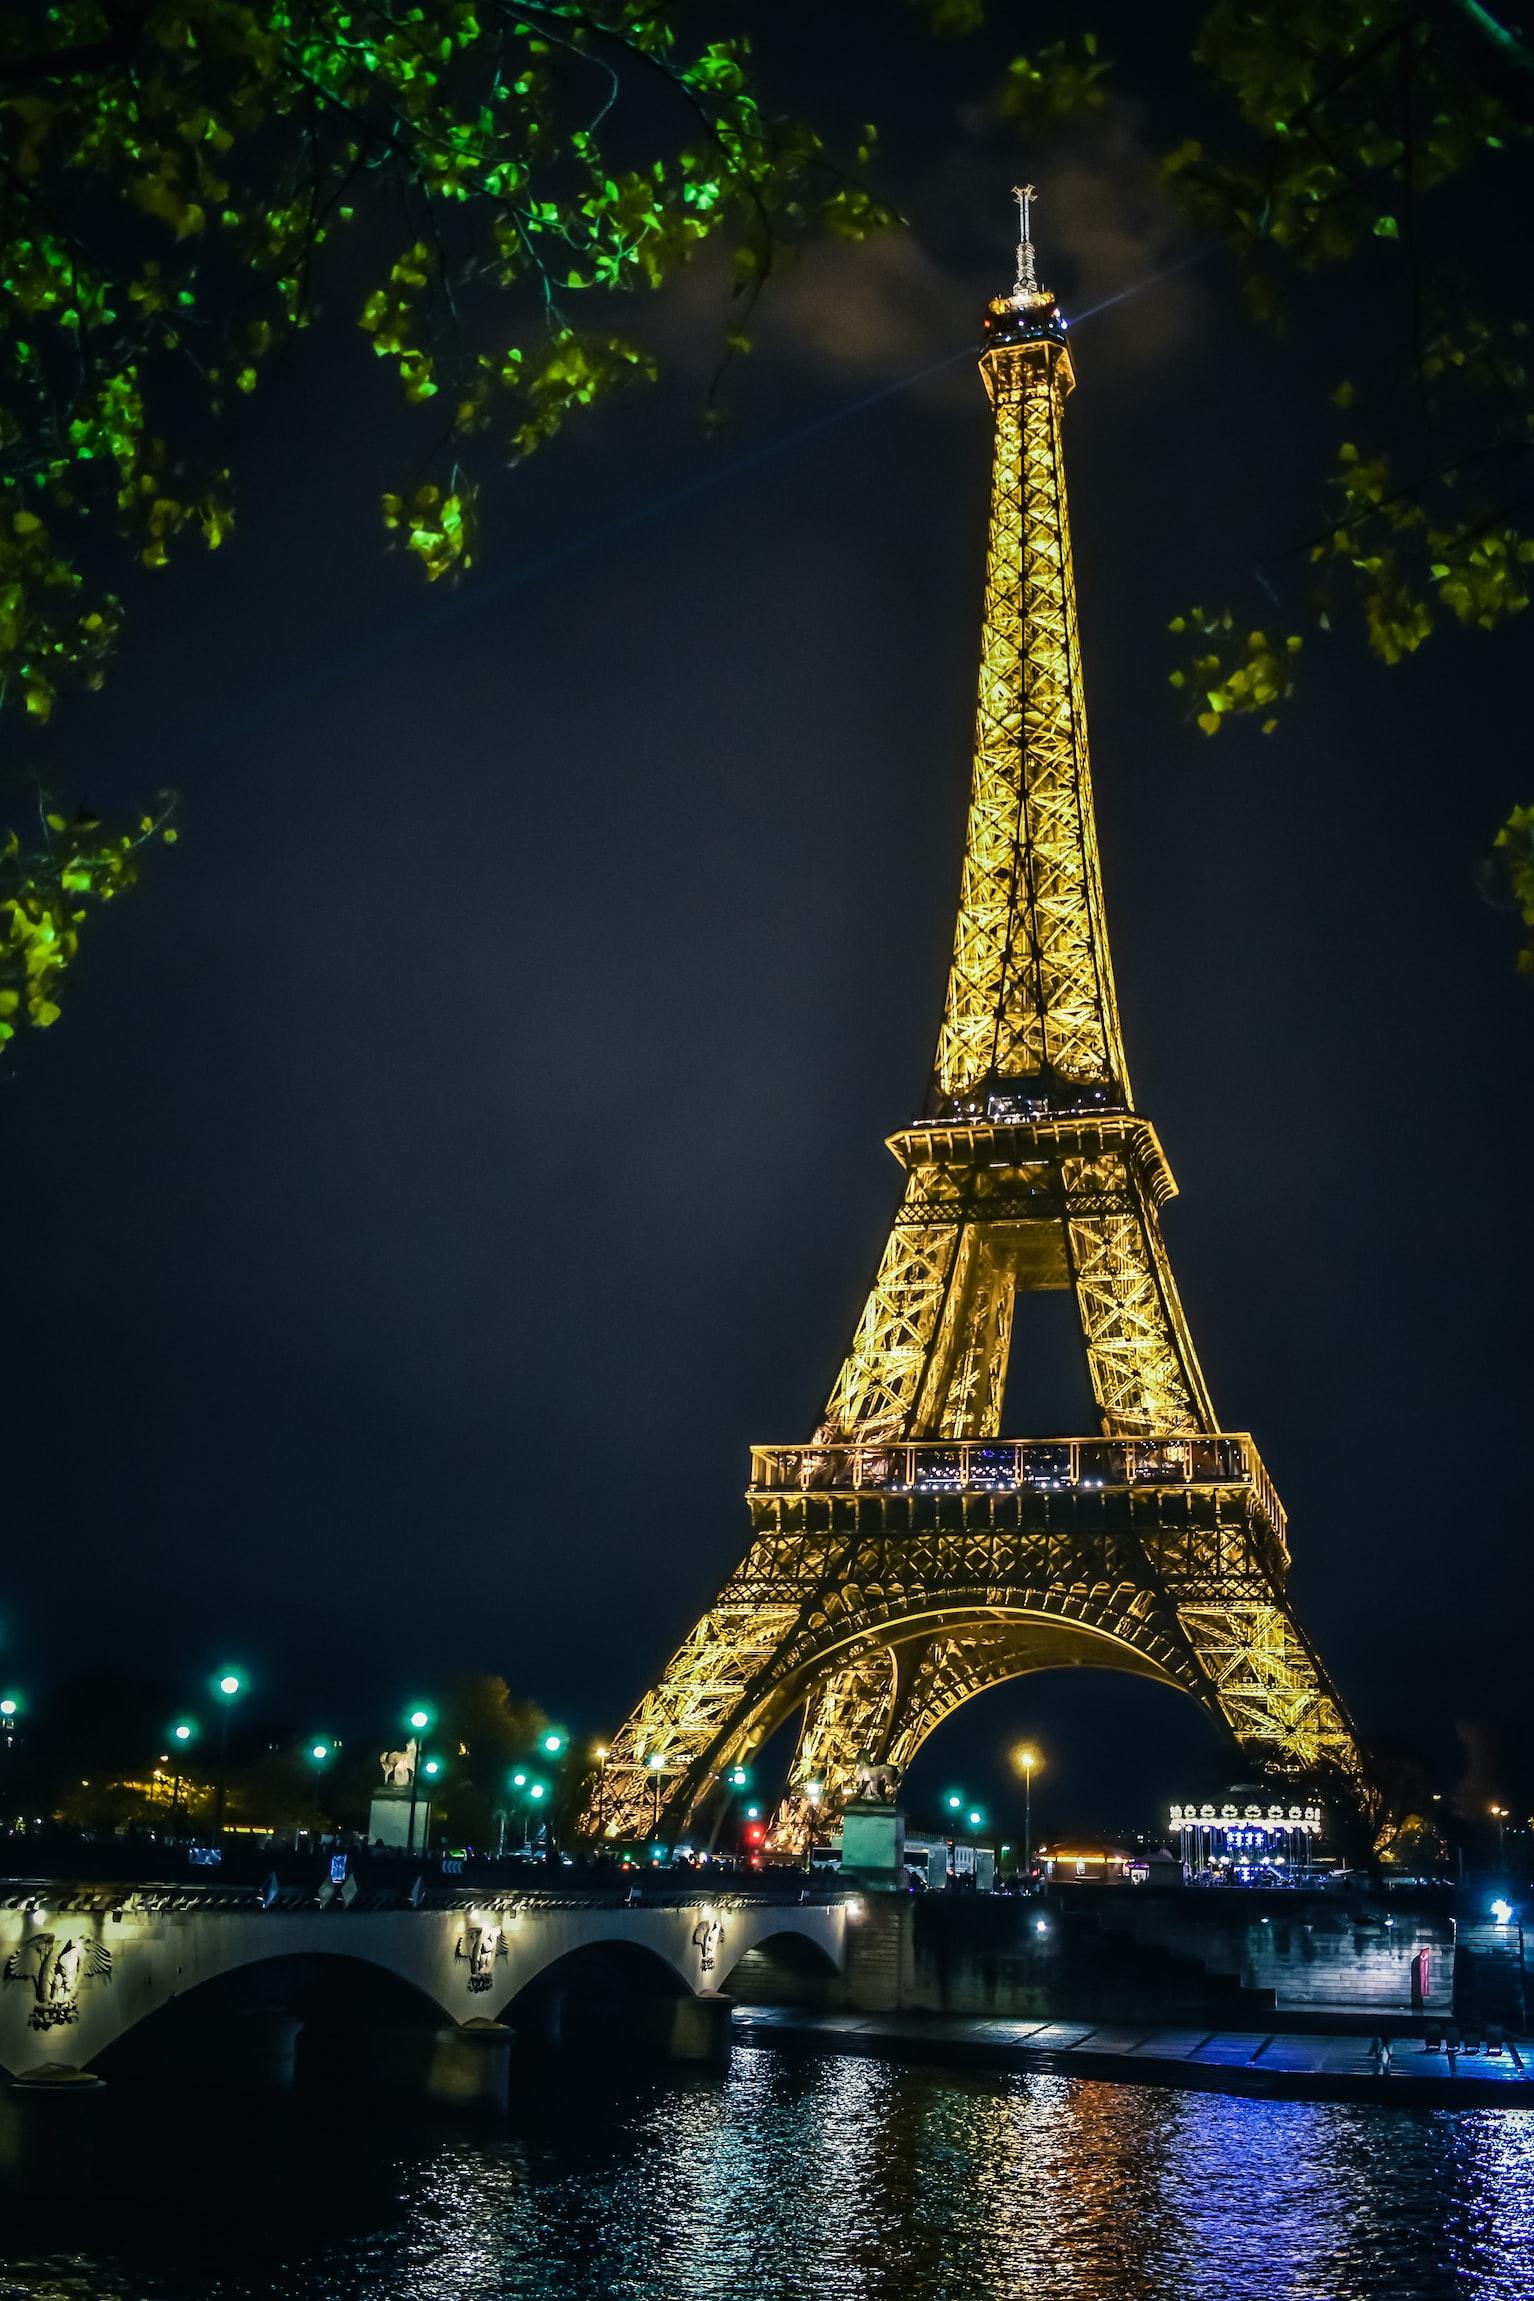 The gorgeous Eiffel Tower